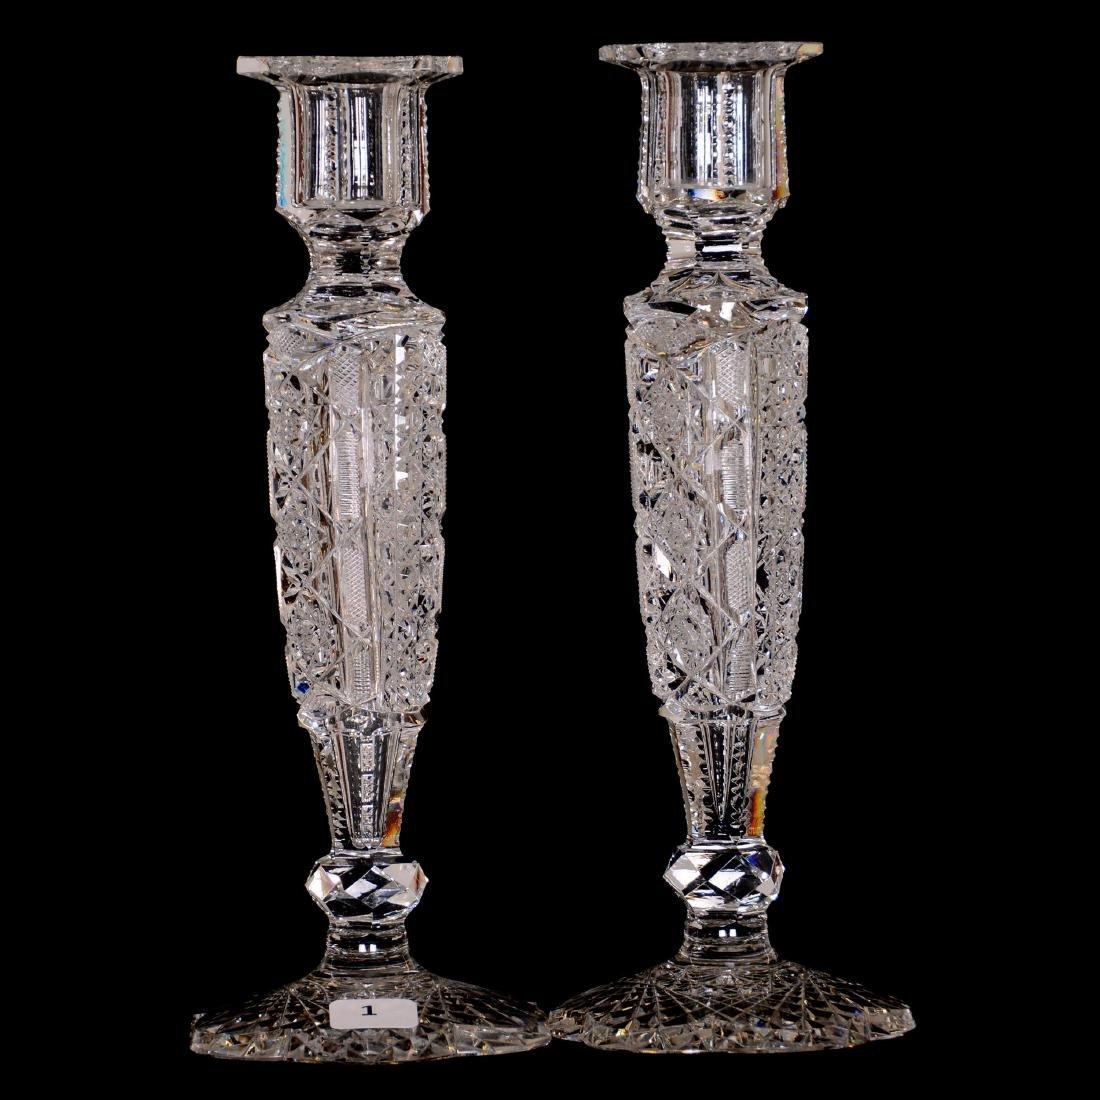 Pair Candle Holders - BPCG